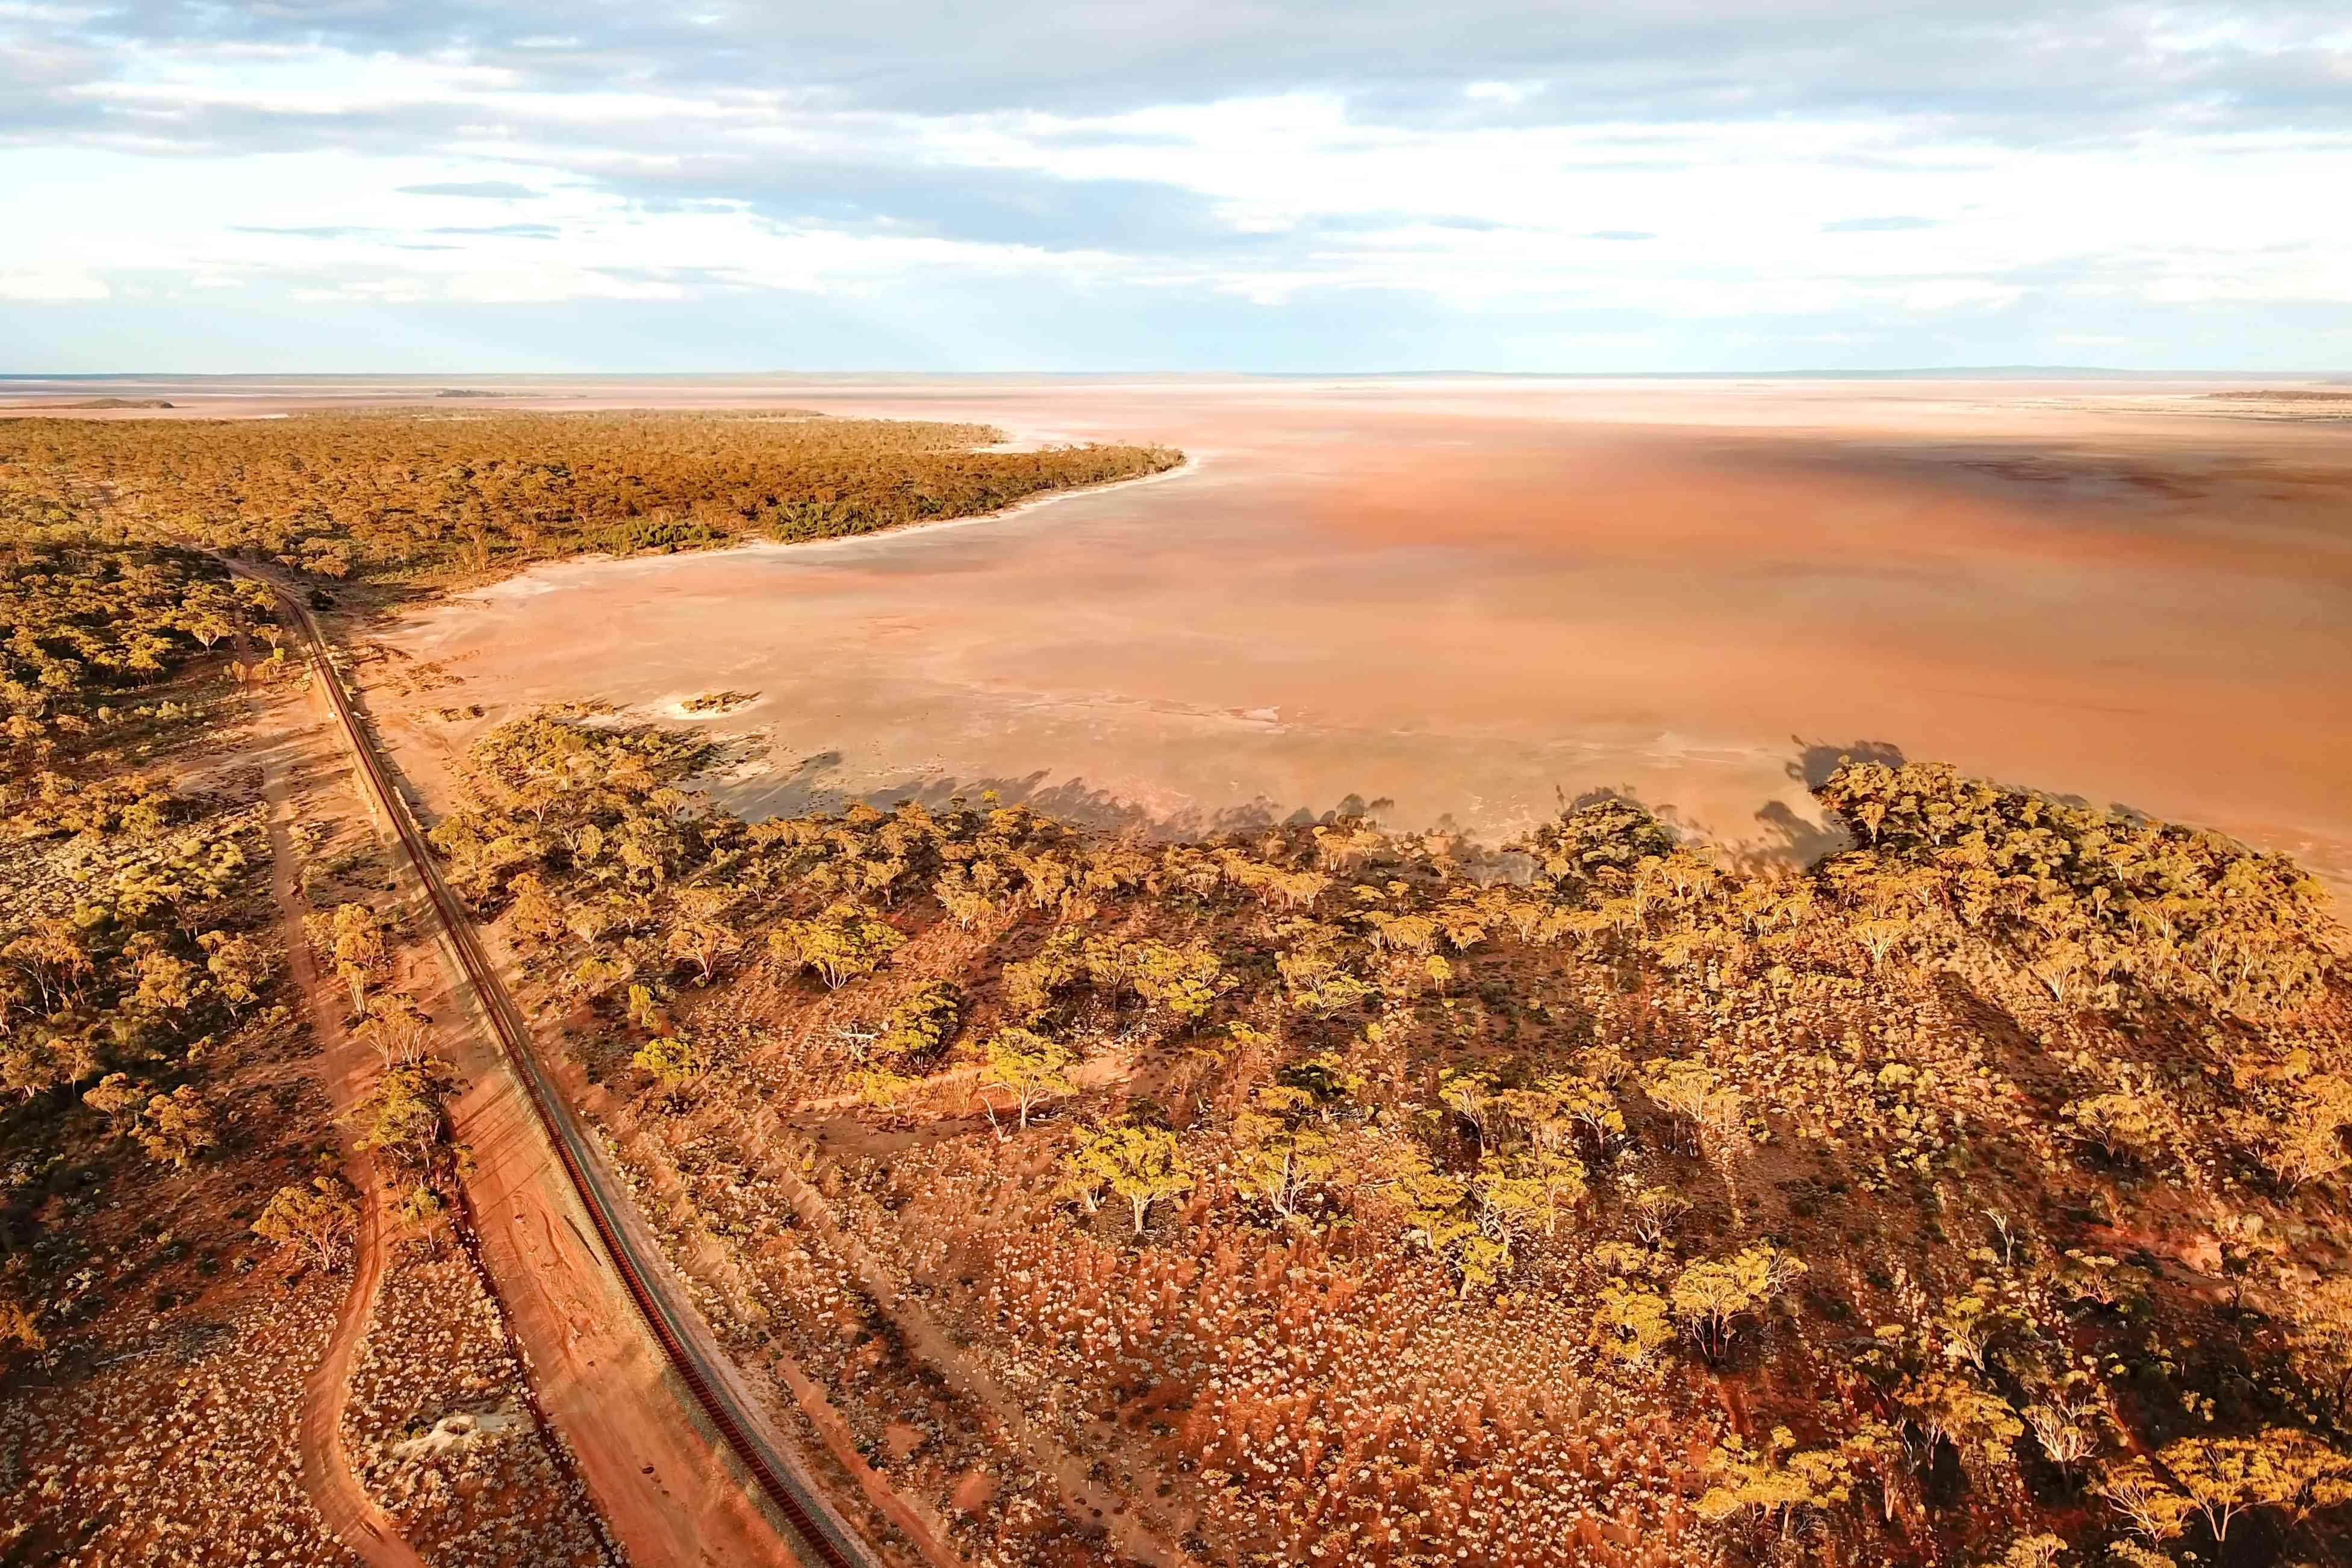 Indian Pacific Railroad cutting across Australian savannah and bush